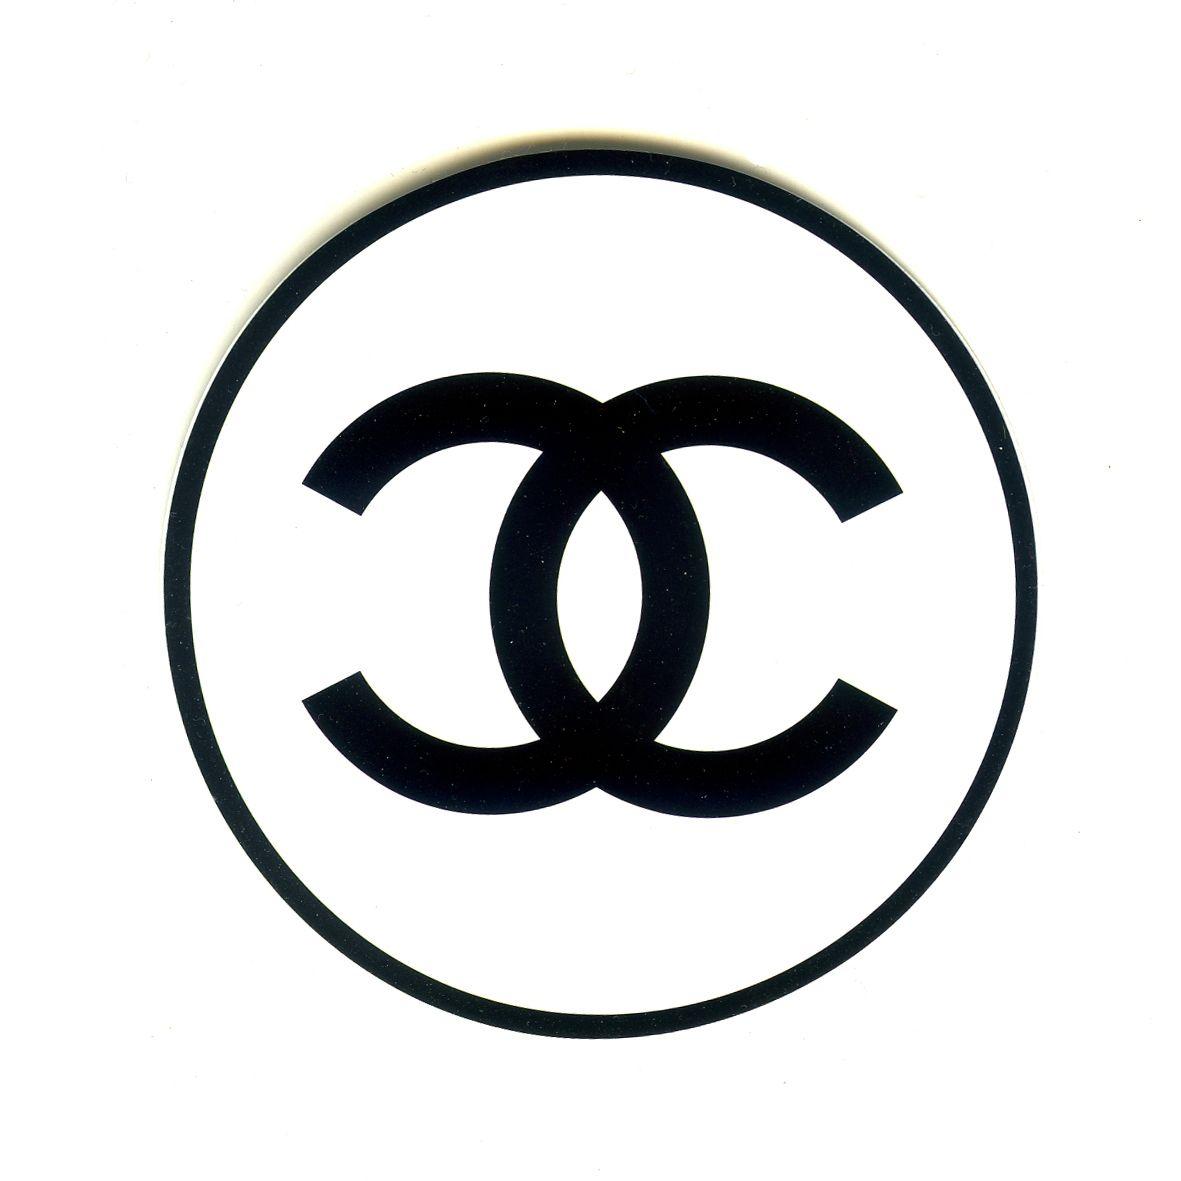 1554 chanel logo black white width 8 cm decal sticker decalstar com